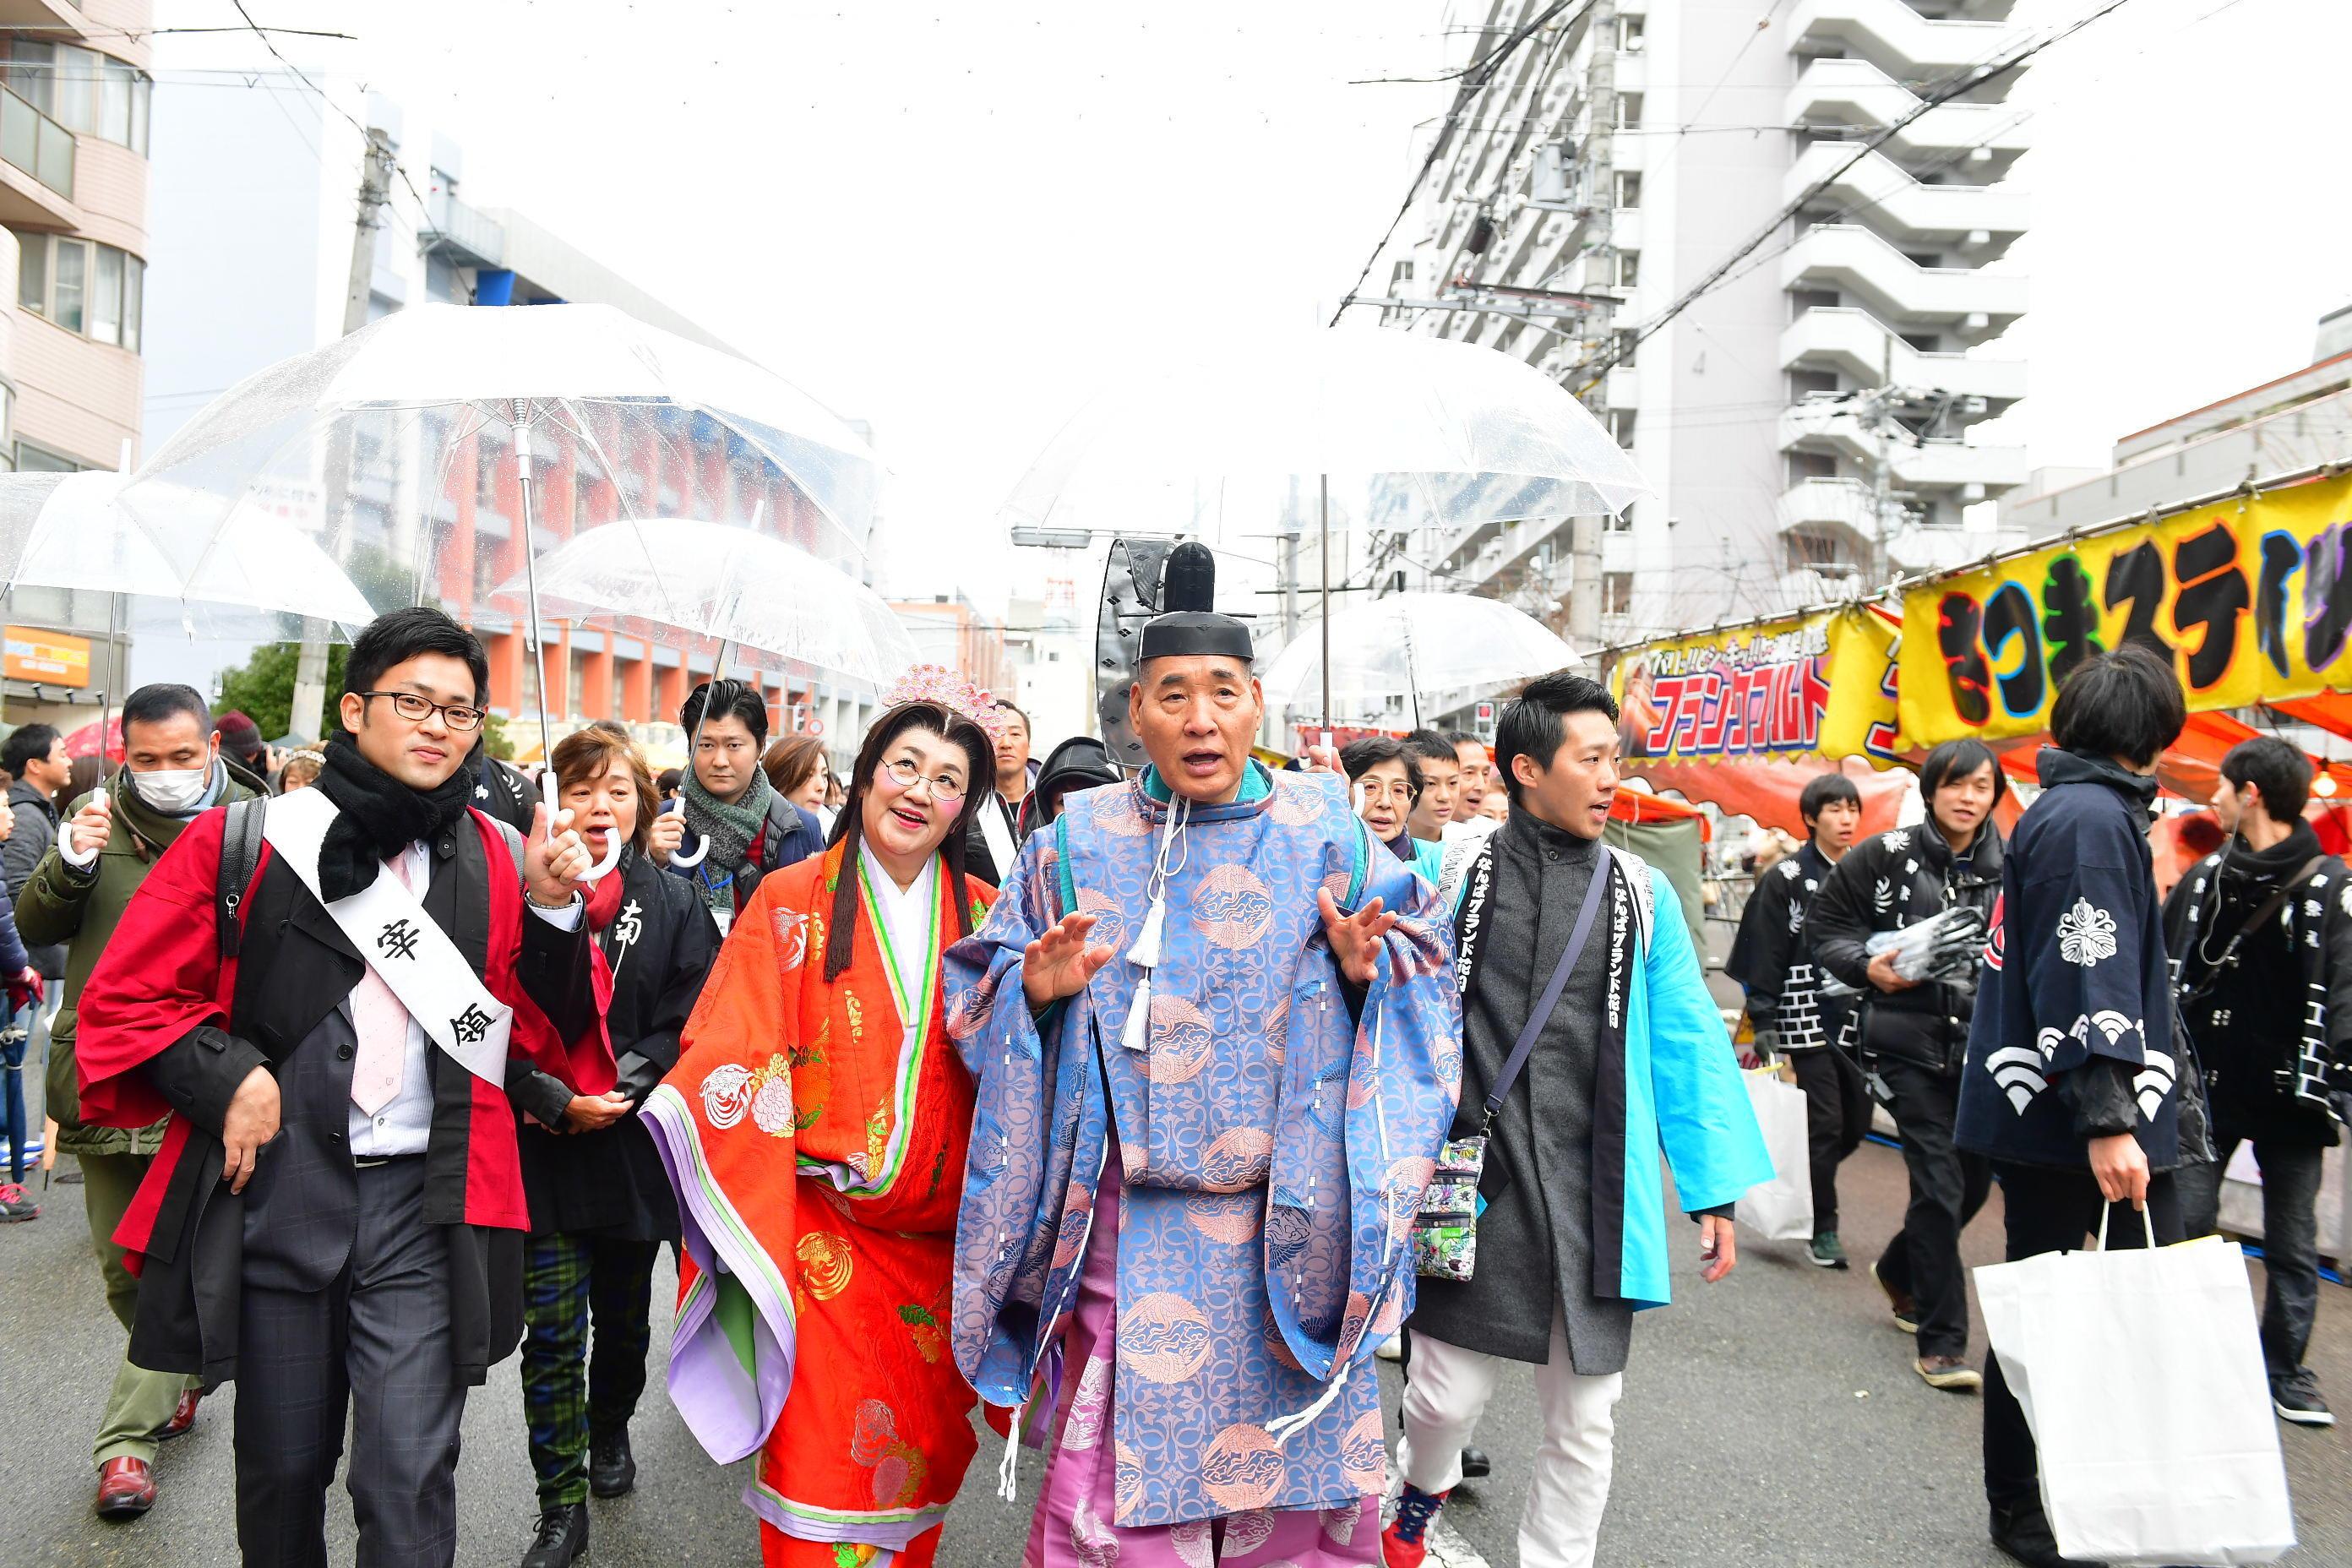 http://news.yoshimoto.co.jp/20180111083804-089ace9a20ced2fd1eda08e0595804e0d738d3a2.jpg